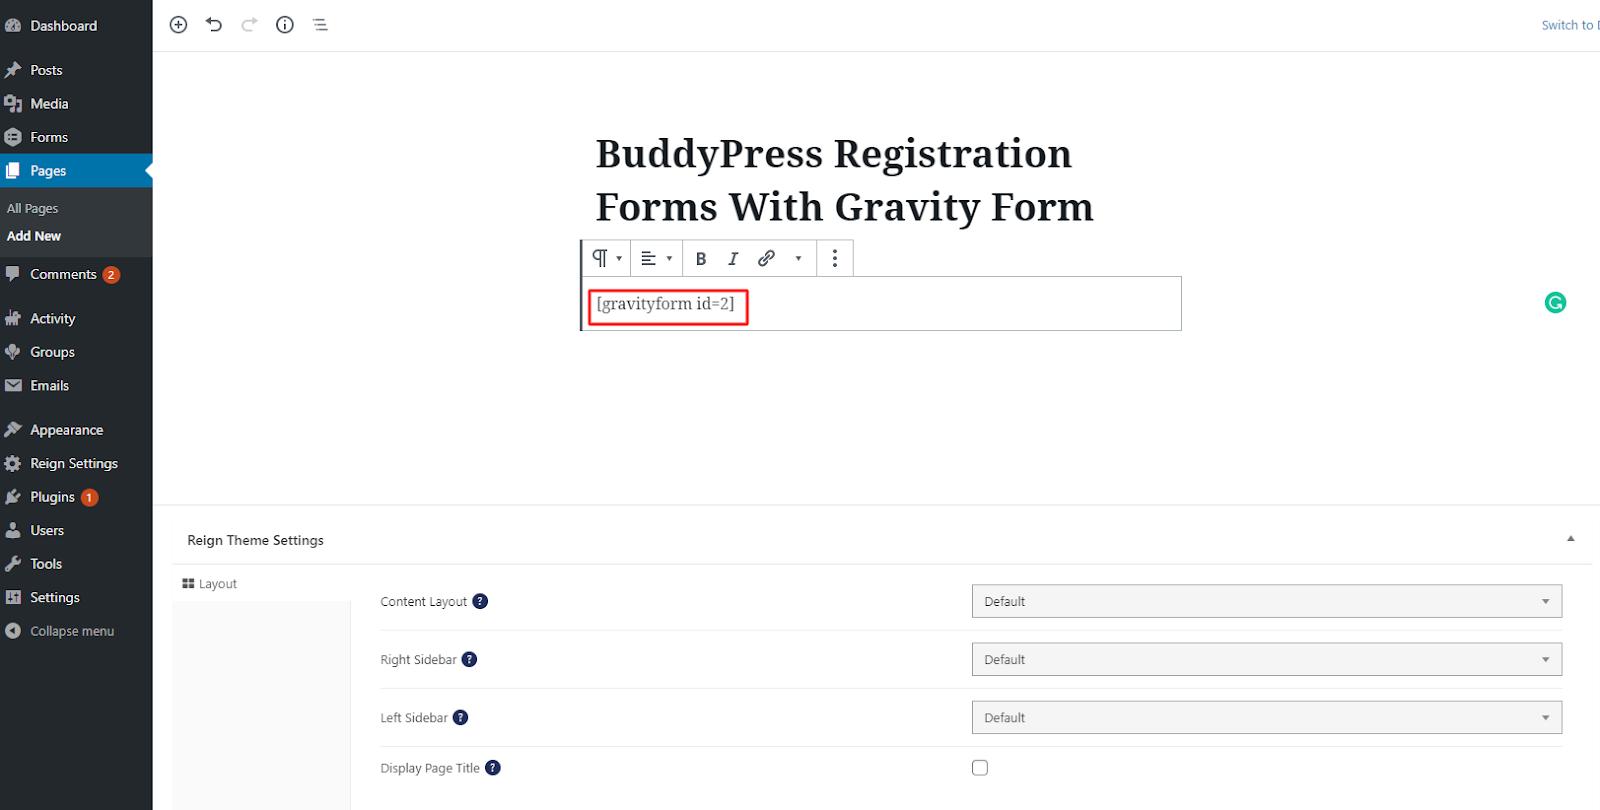 Buddypress Registration Forms shortcode